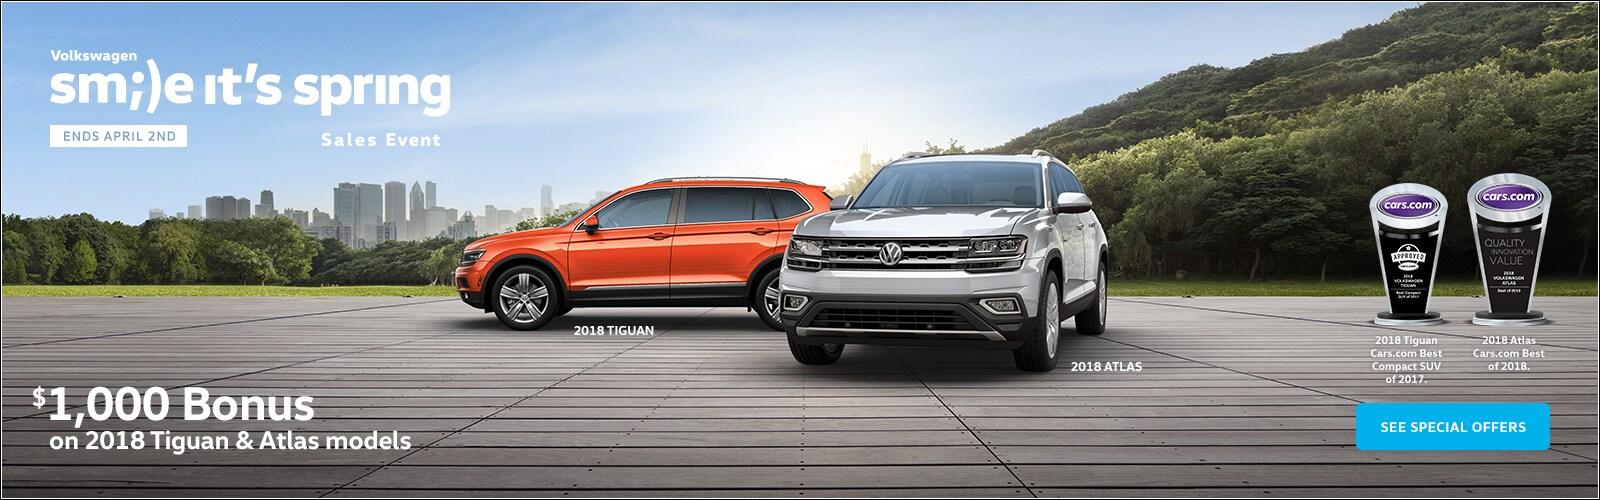 Mckenna volkswagen cerritos new used vw dealer in for Ed carroll motor company